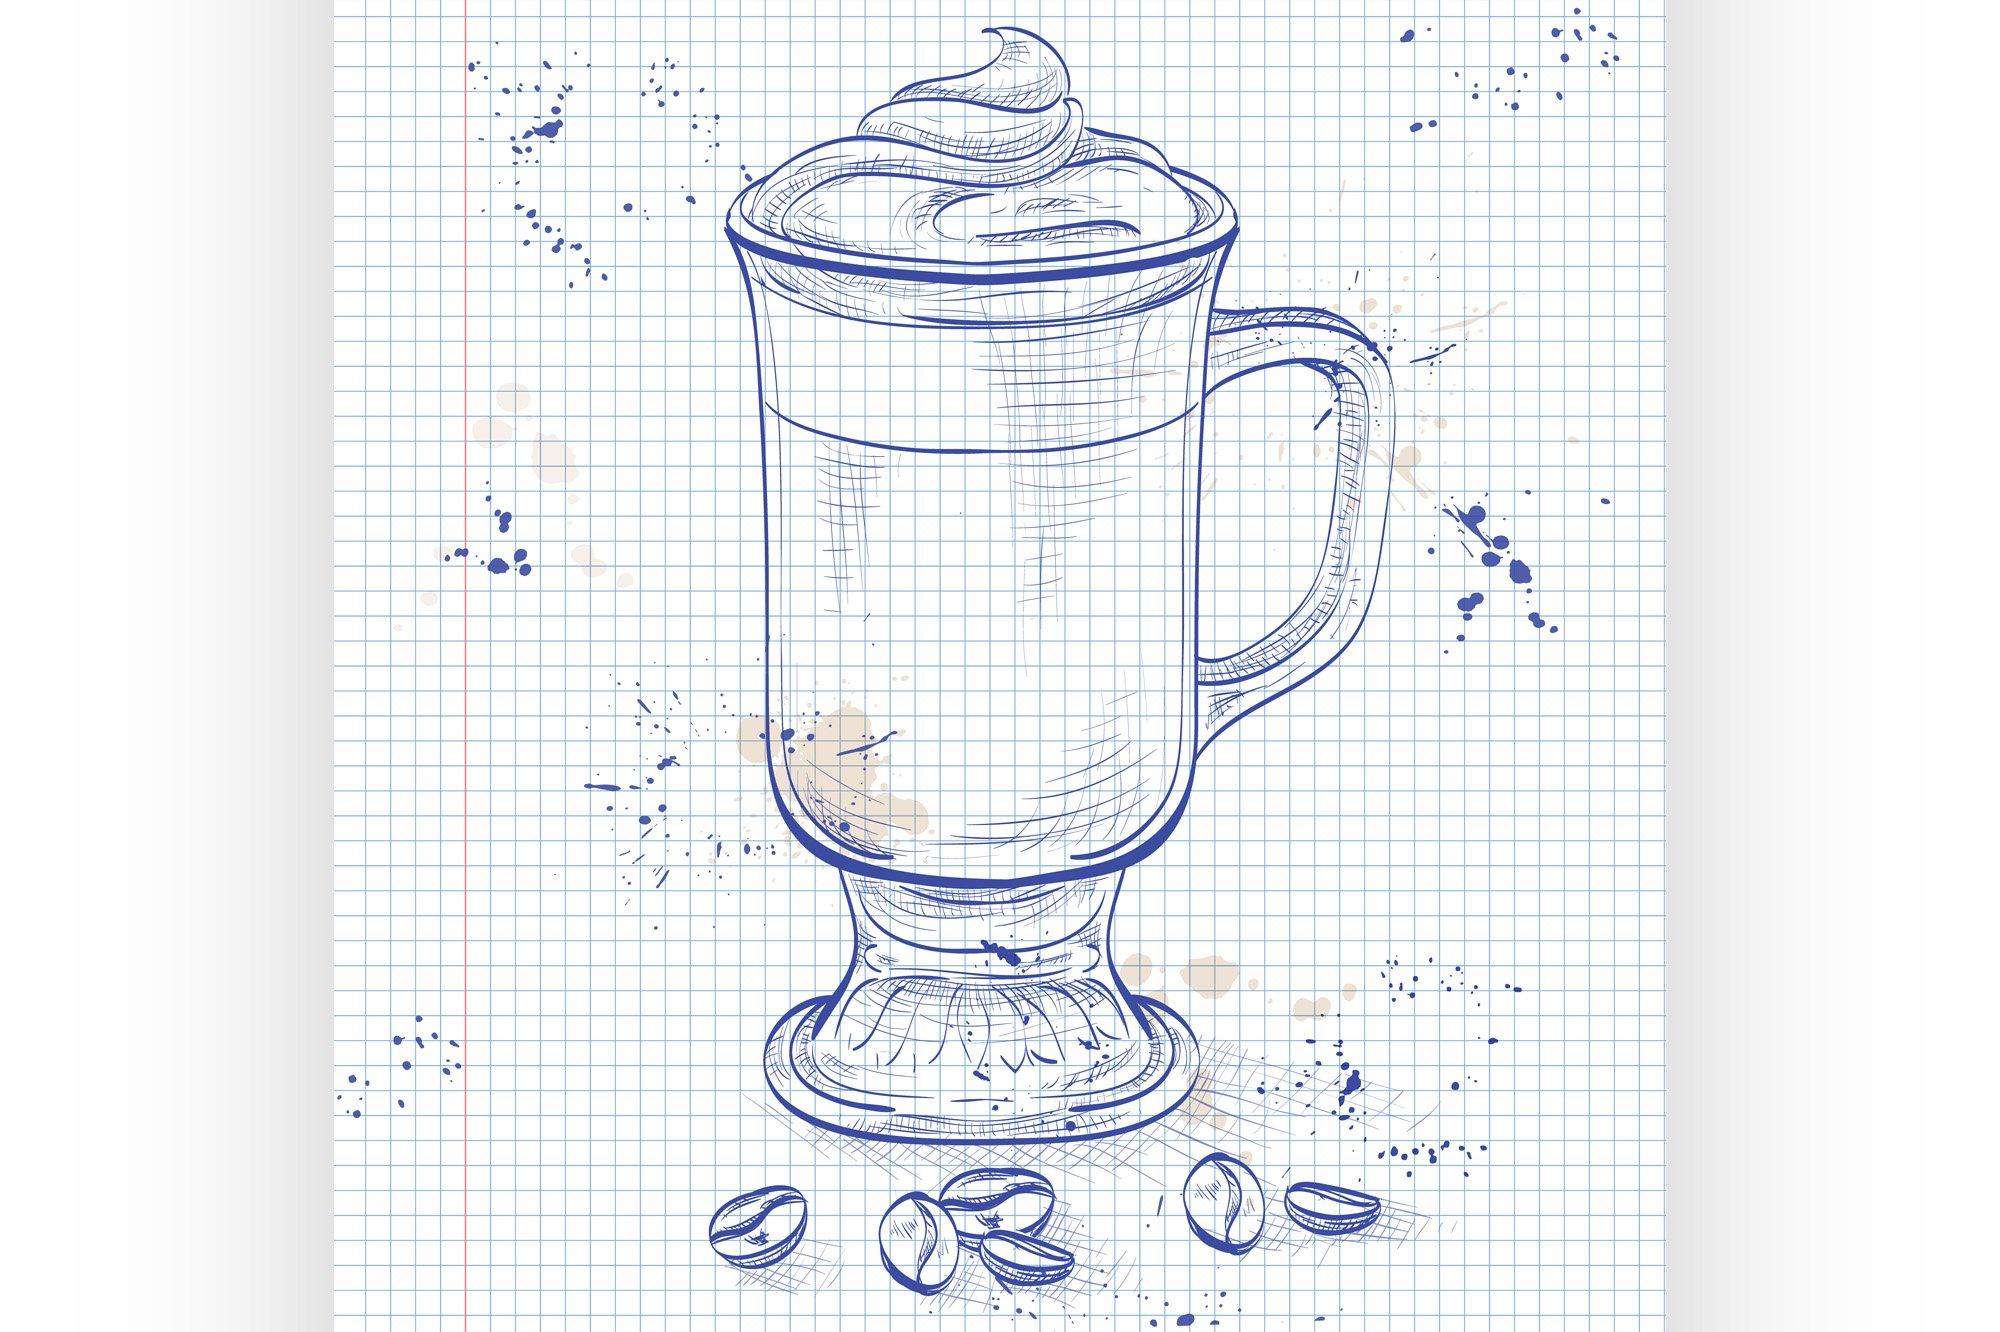 Irish cream coffee on a notebook page example image 1